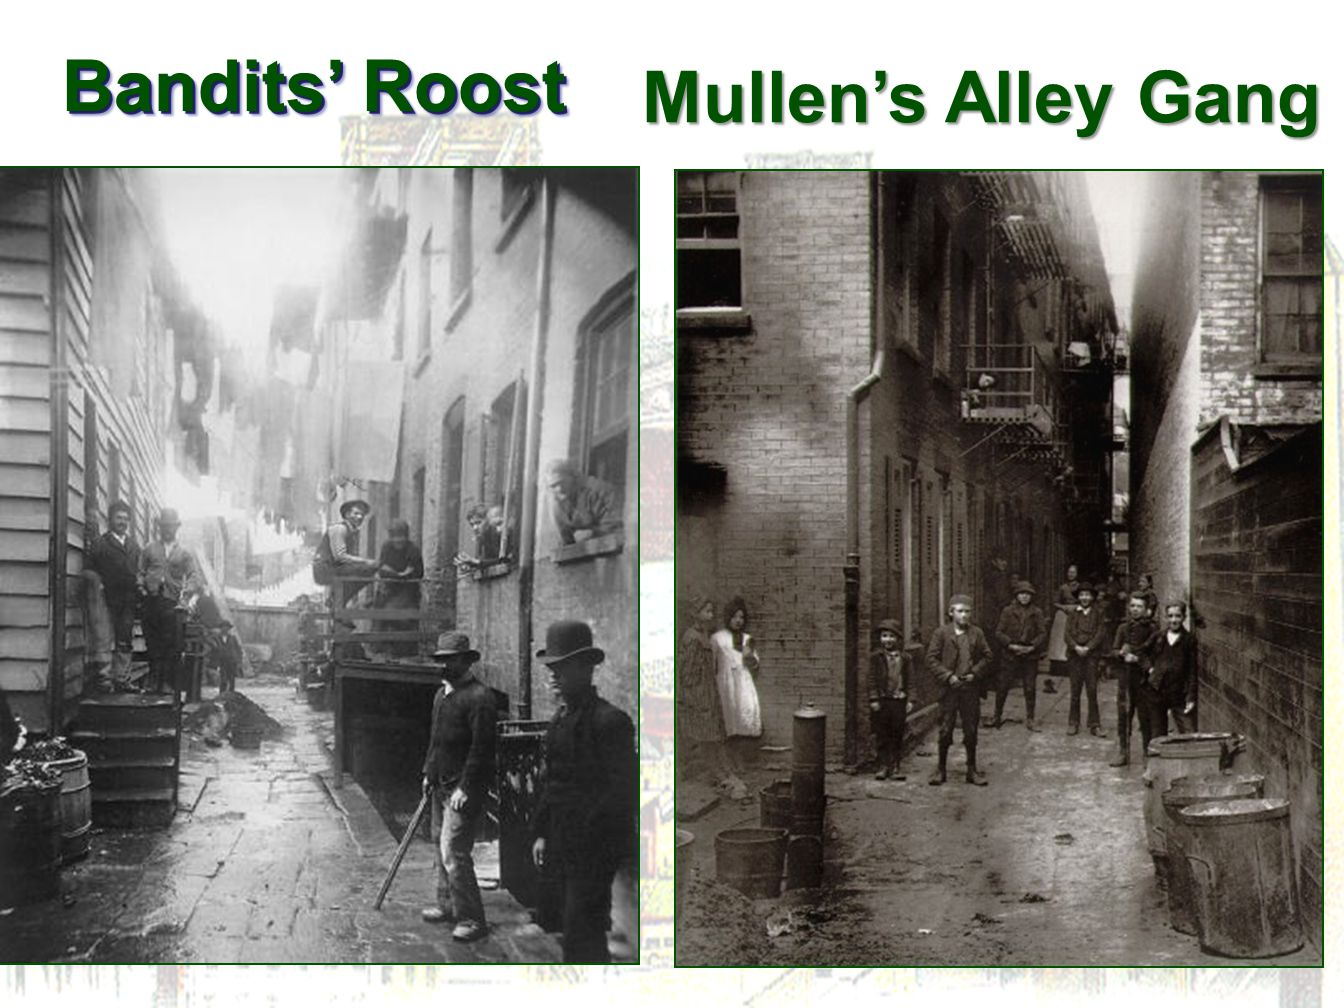 Bandits' Roost Mullen's Alley Gang